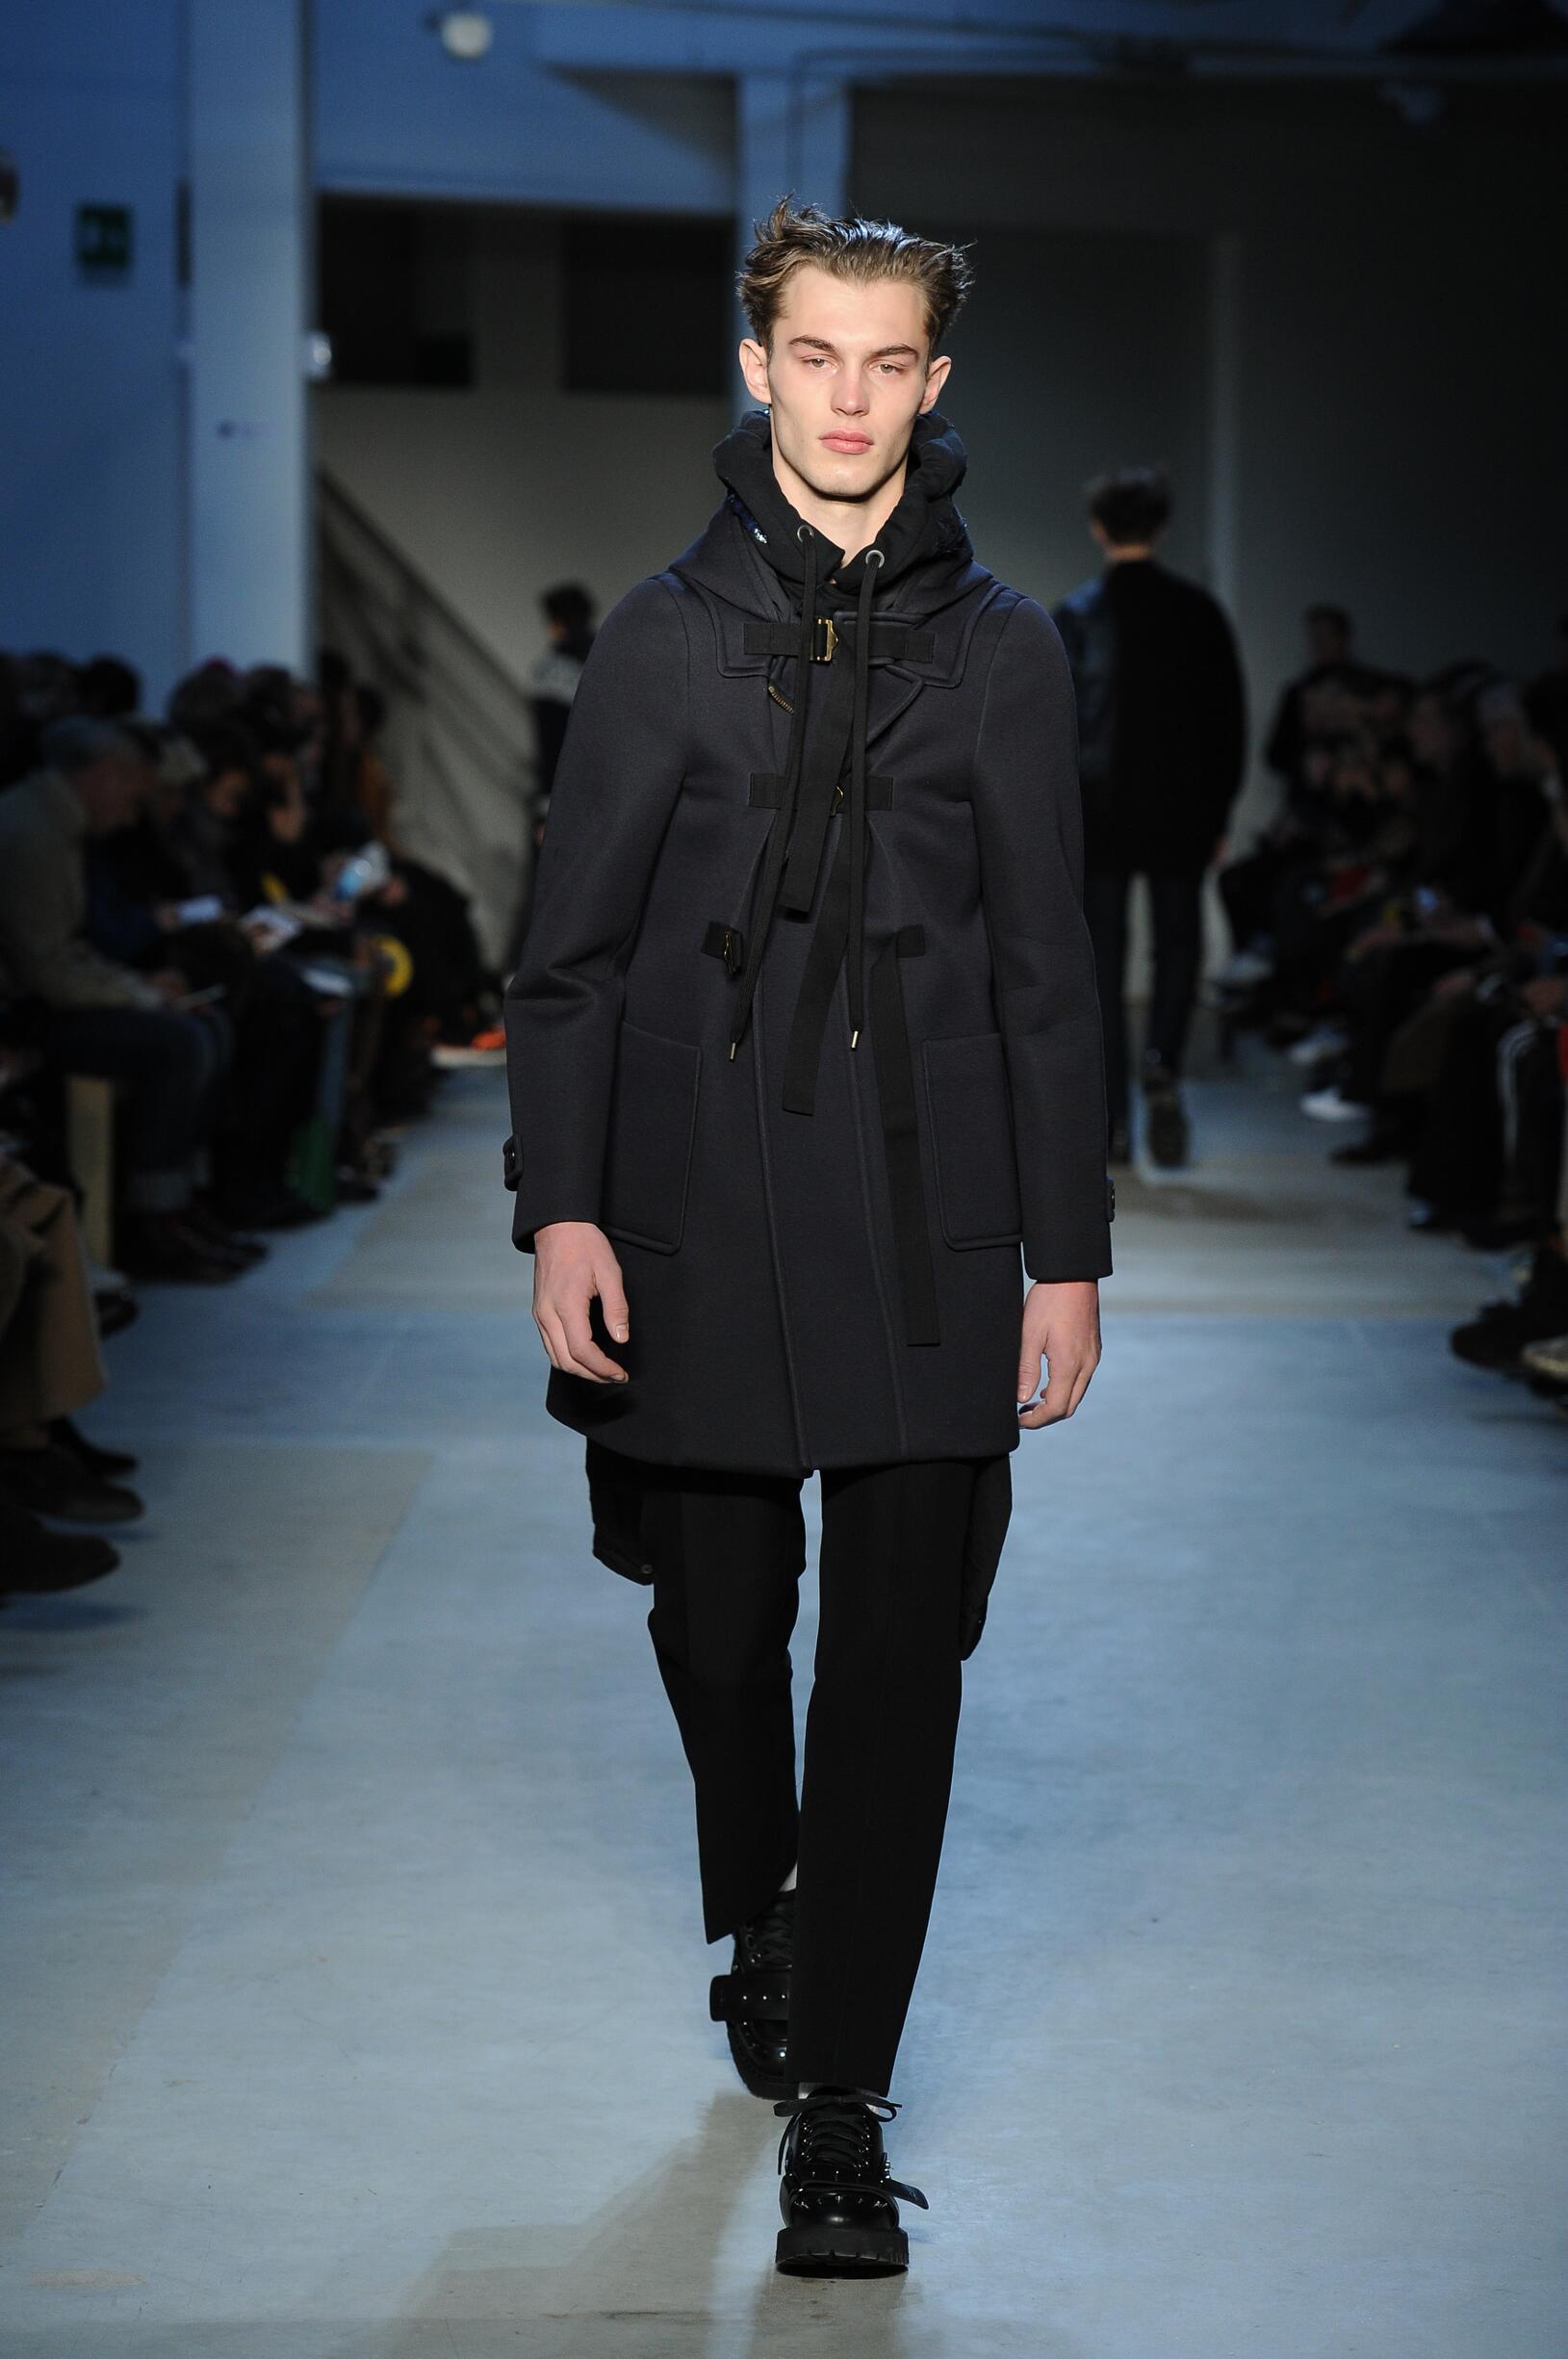 Fall Fashion Man Trends 2017 N°21